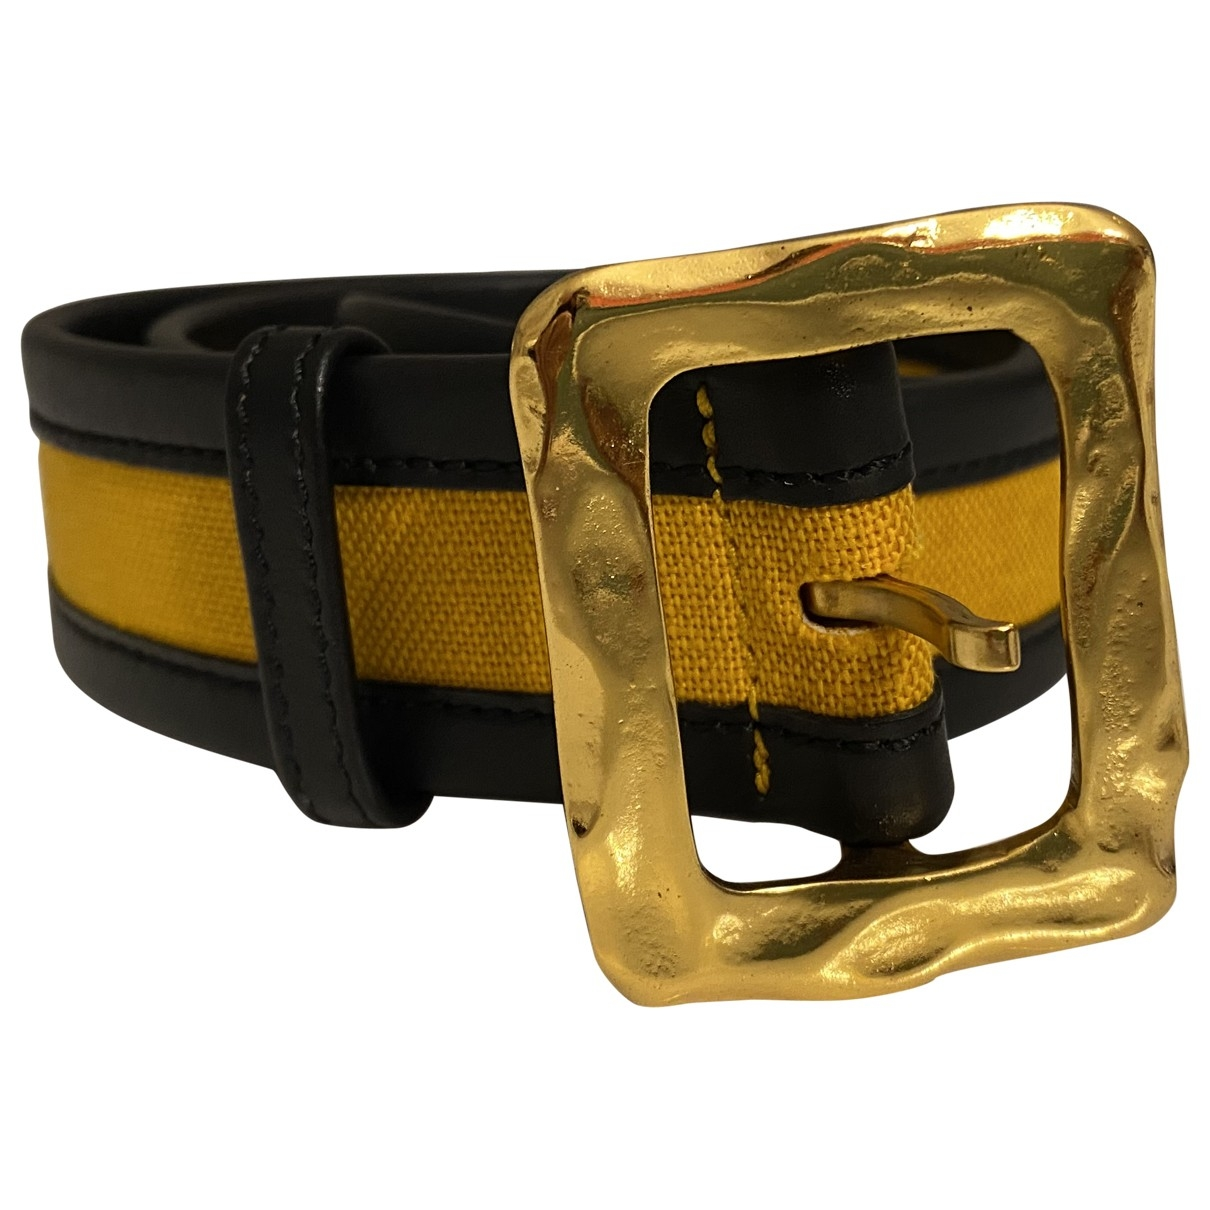 Cinturon de Lona Christian Lacroix